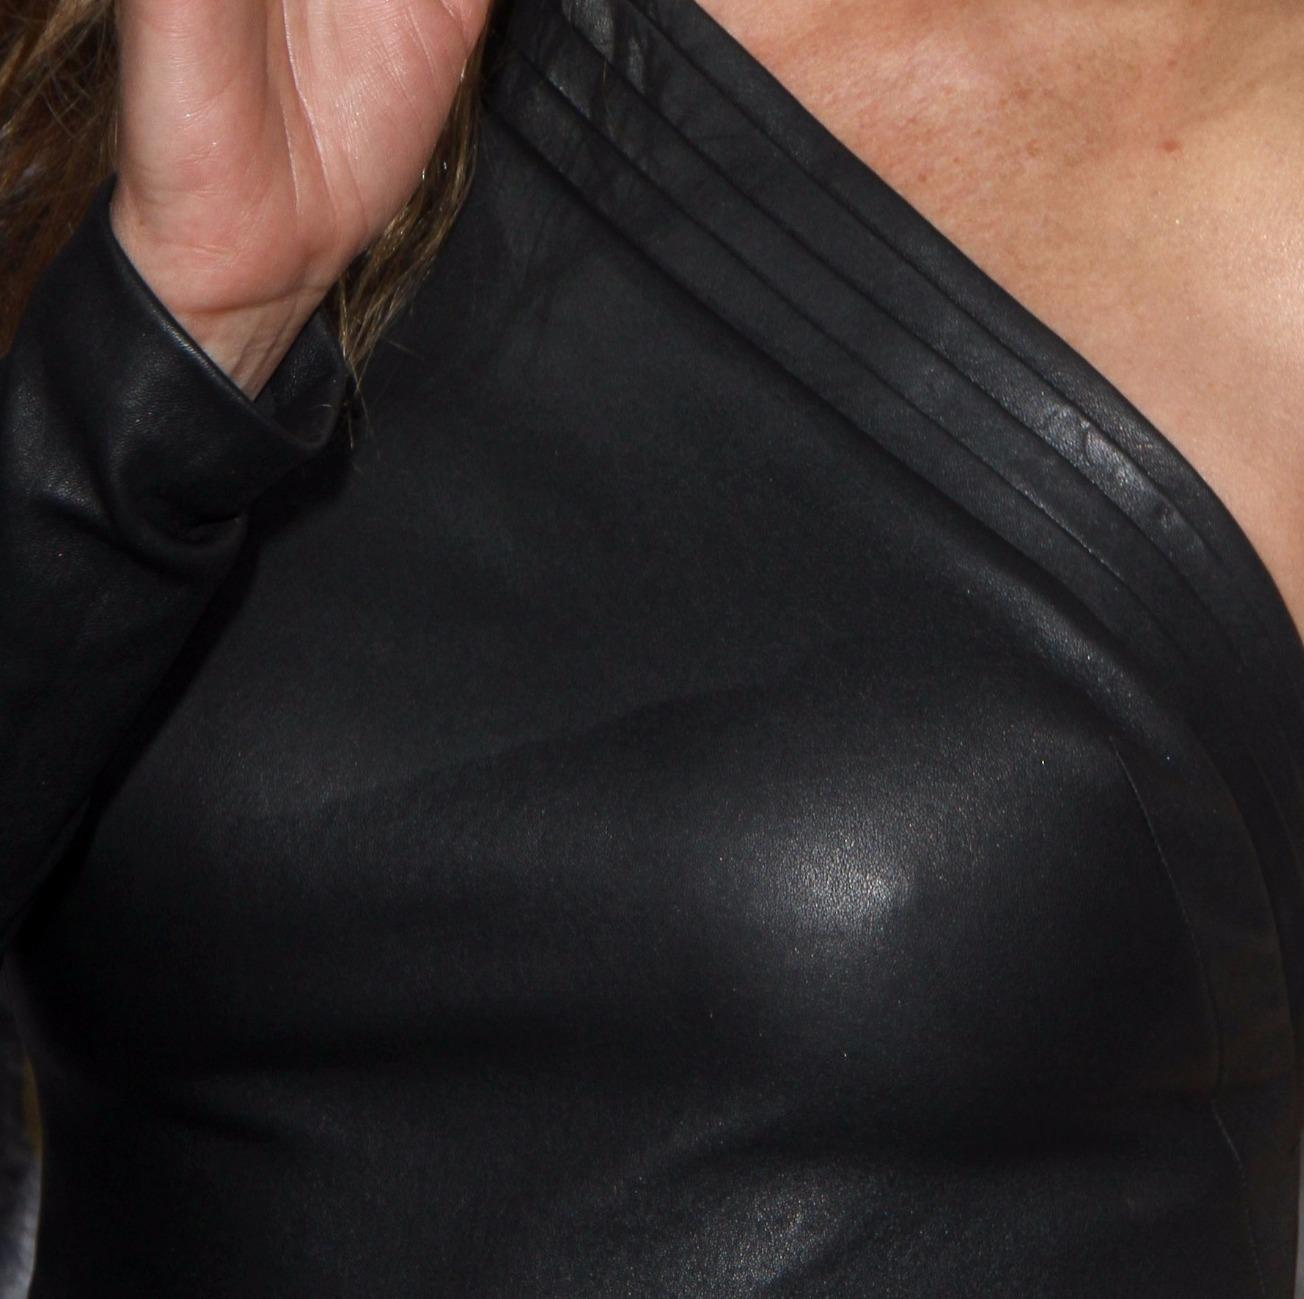 jennifer aniston luce pezones duros en vestido entallado